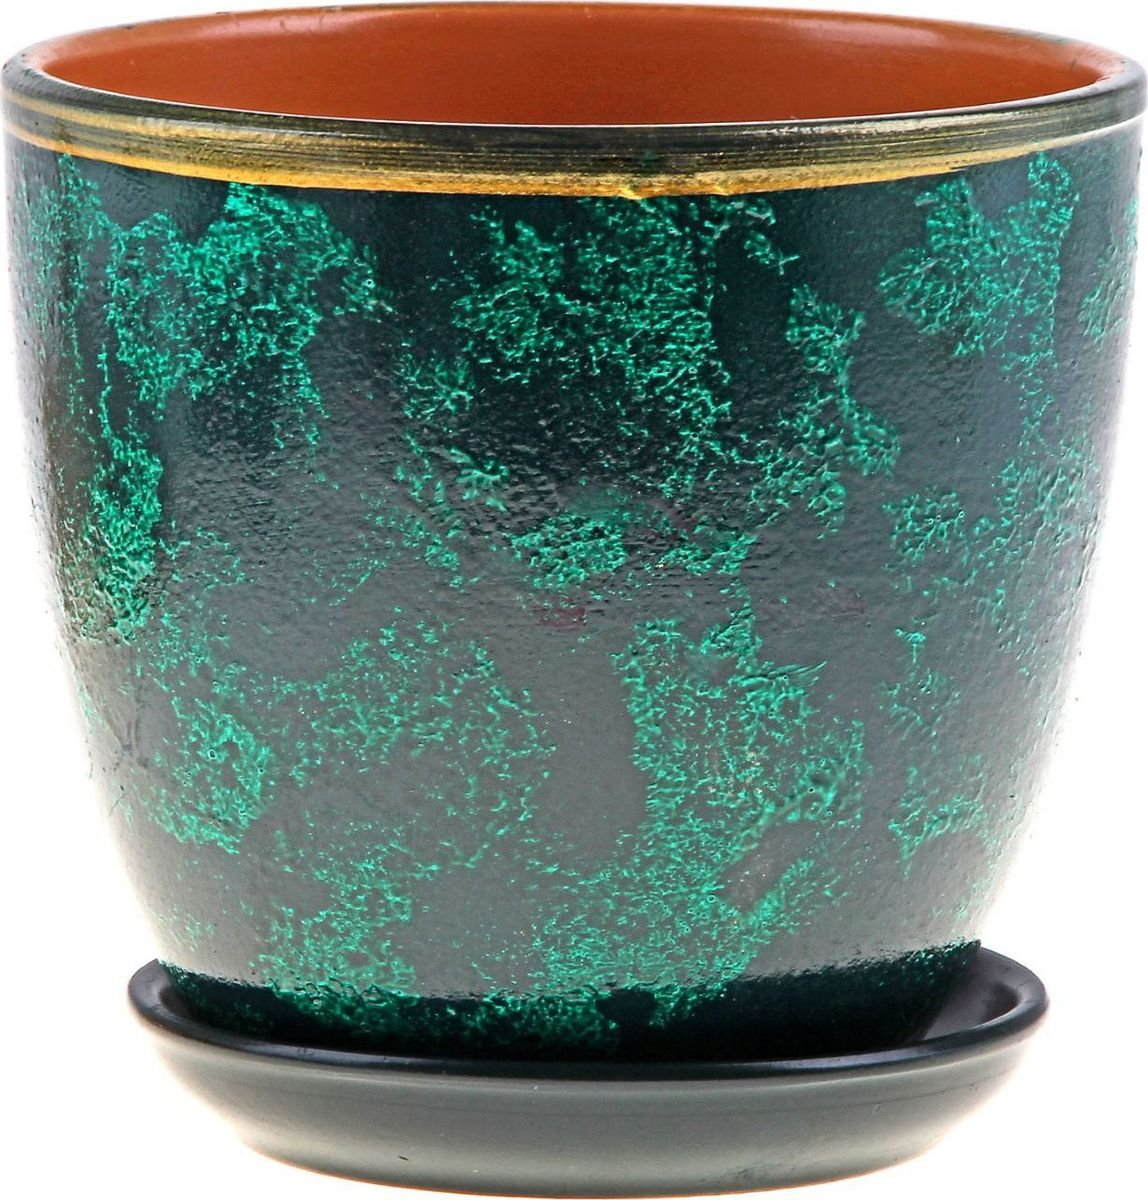 Кашпо Бархат, цвет: зеленый, 2,5 л164892